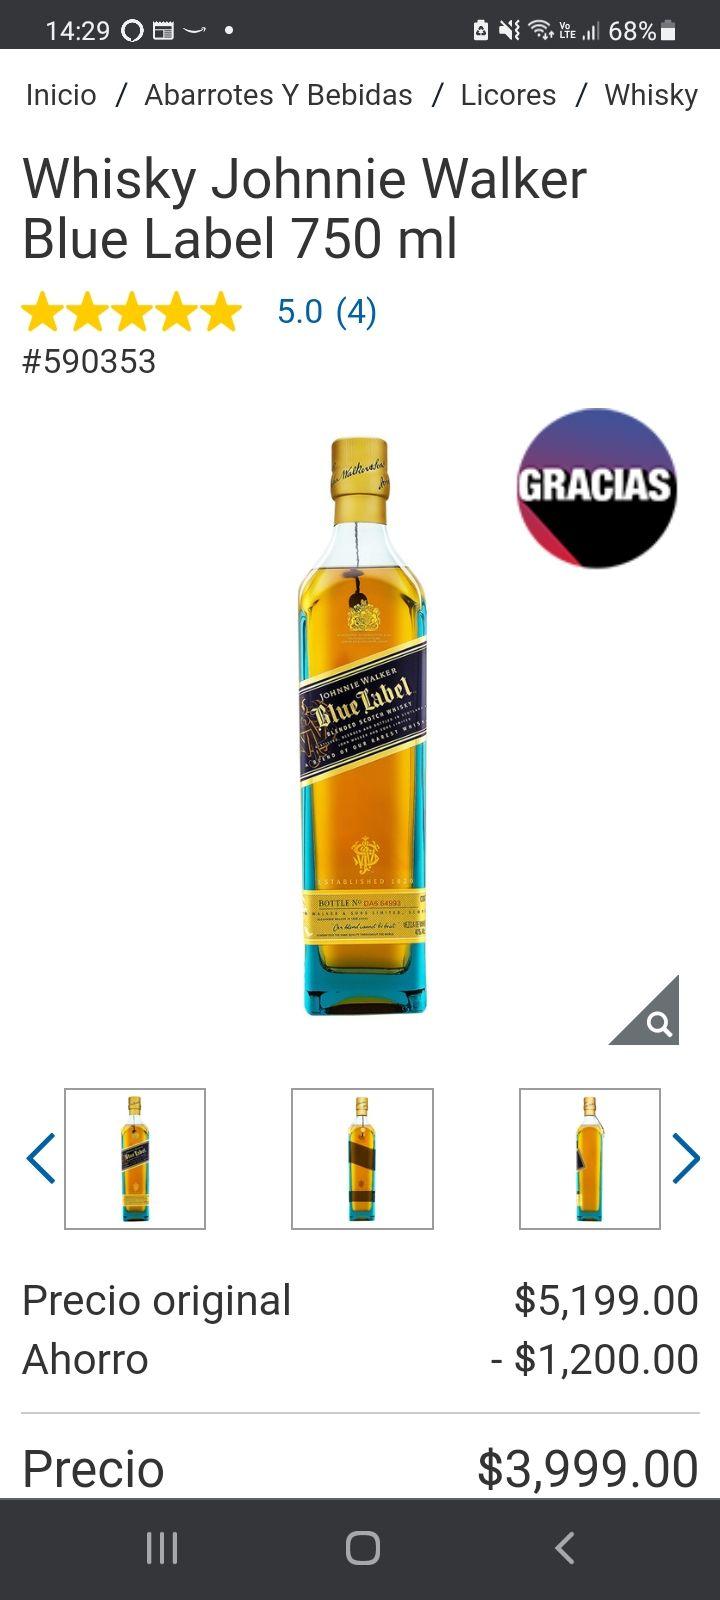 Costco: Whisky Johnnie Walker Blue Label 750 ml